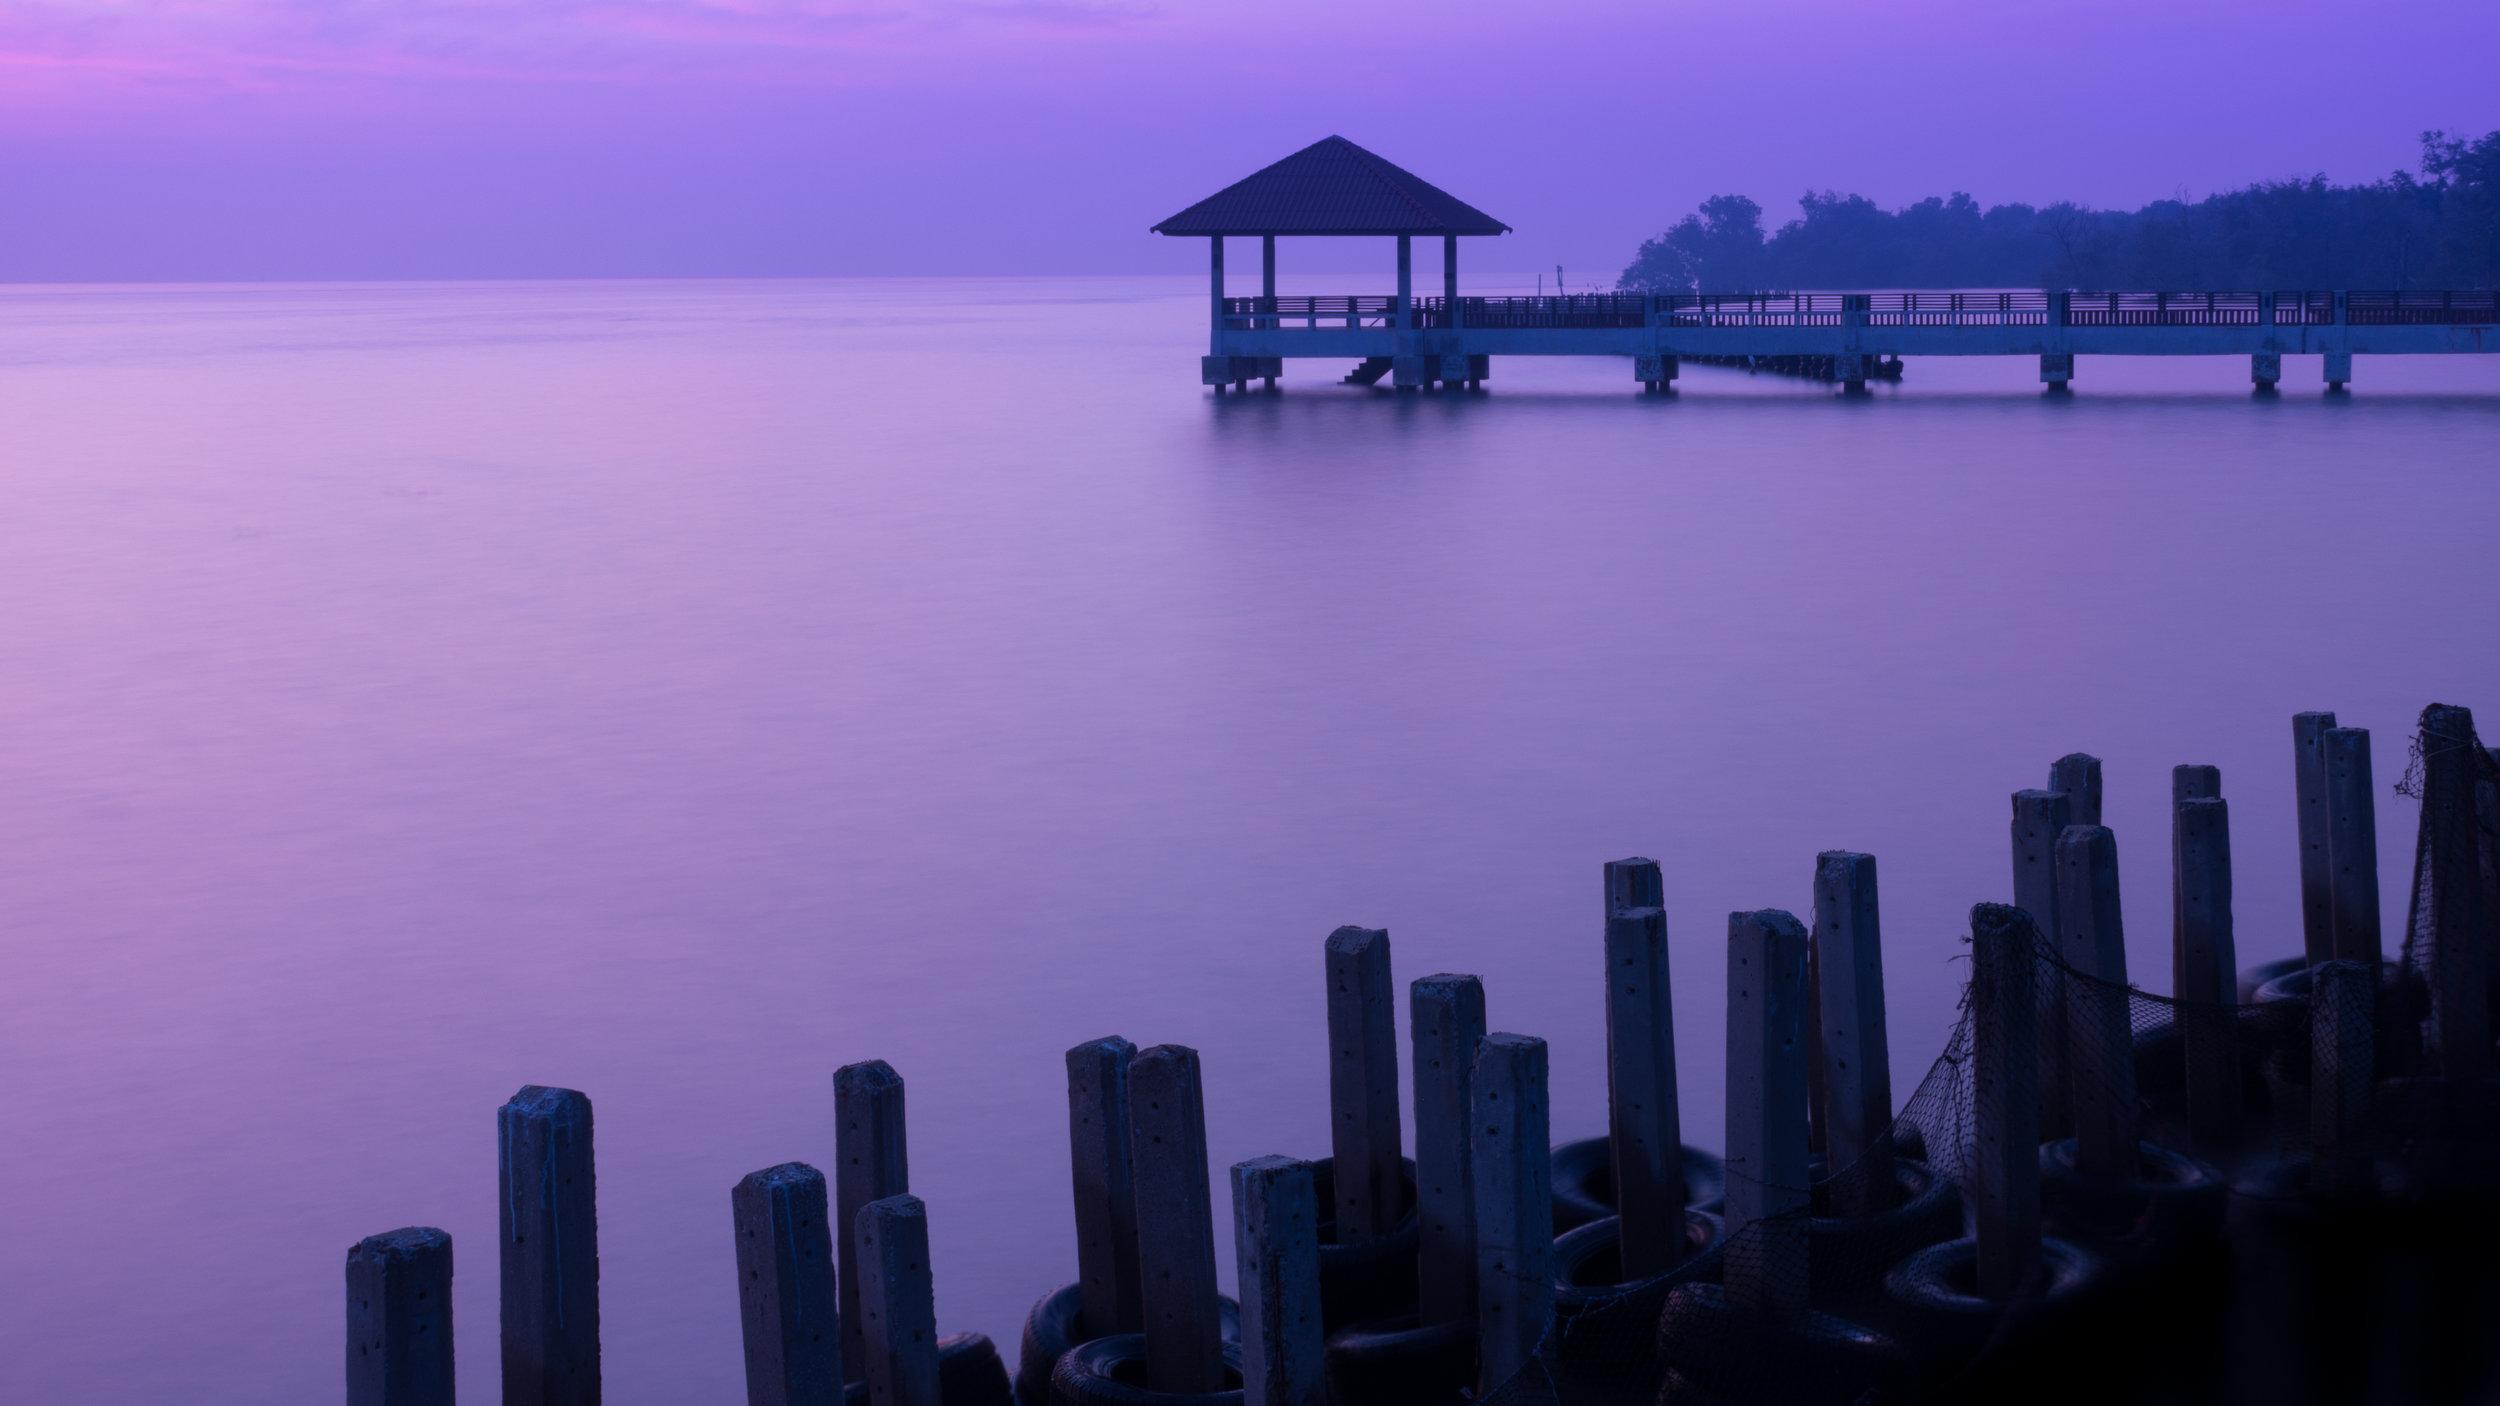 Chao Phraya River Morning.jpg